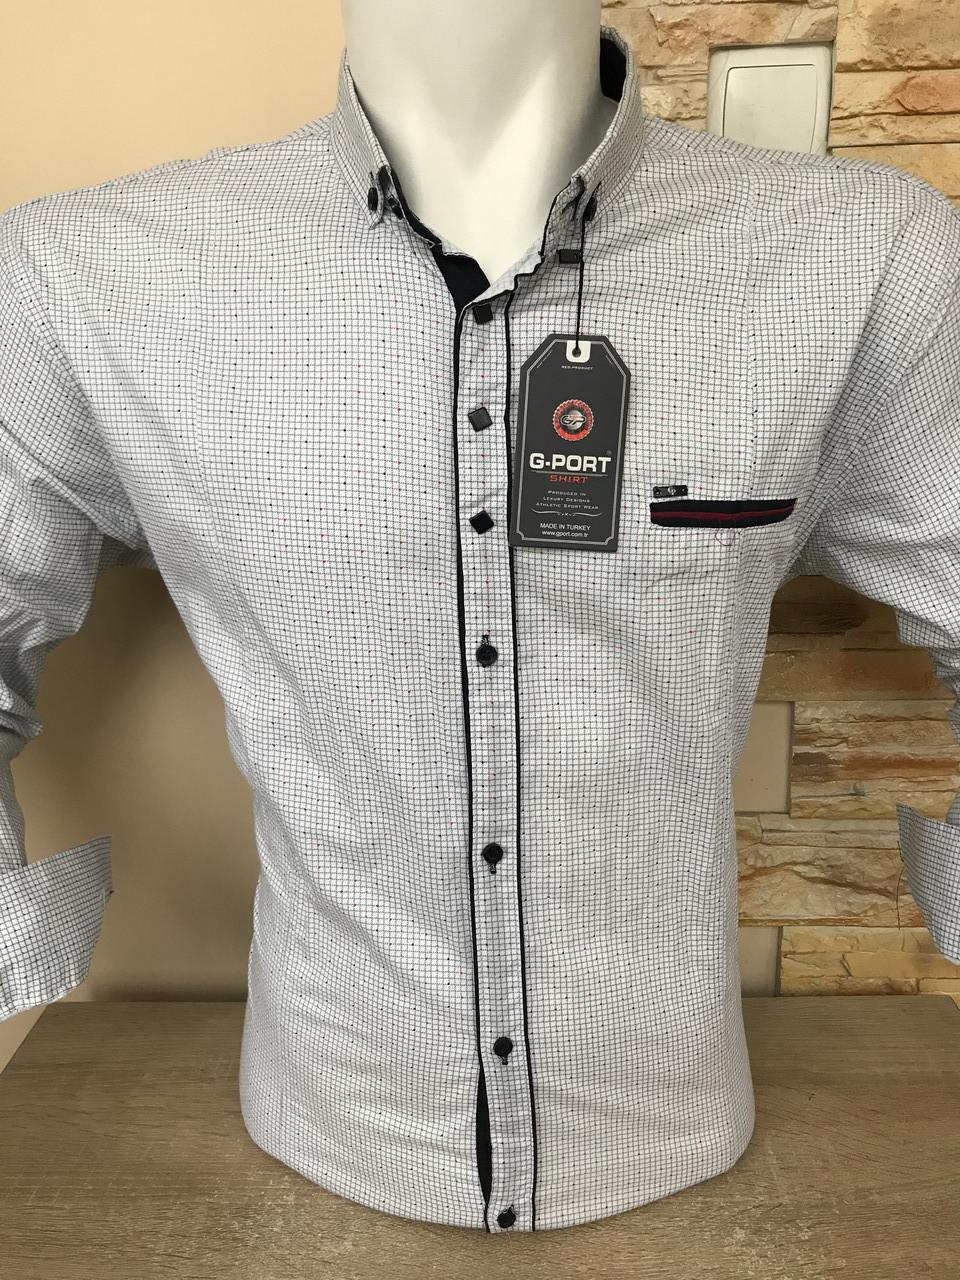 Батальна сорочка стрейч-котон G-port -320